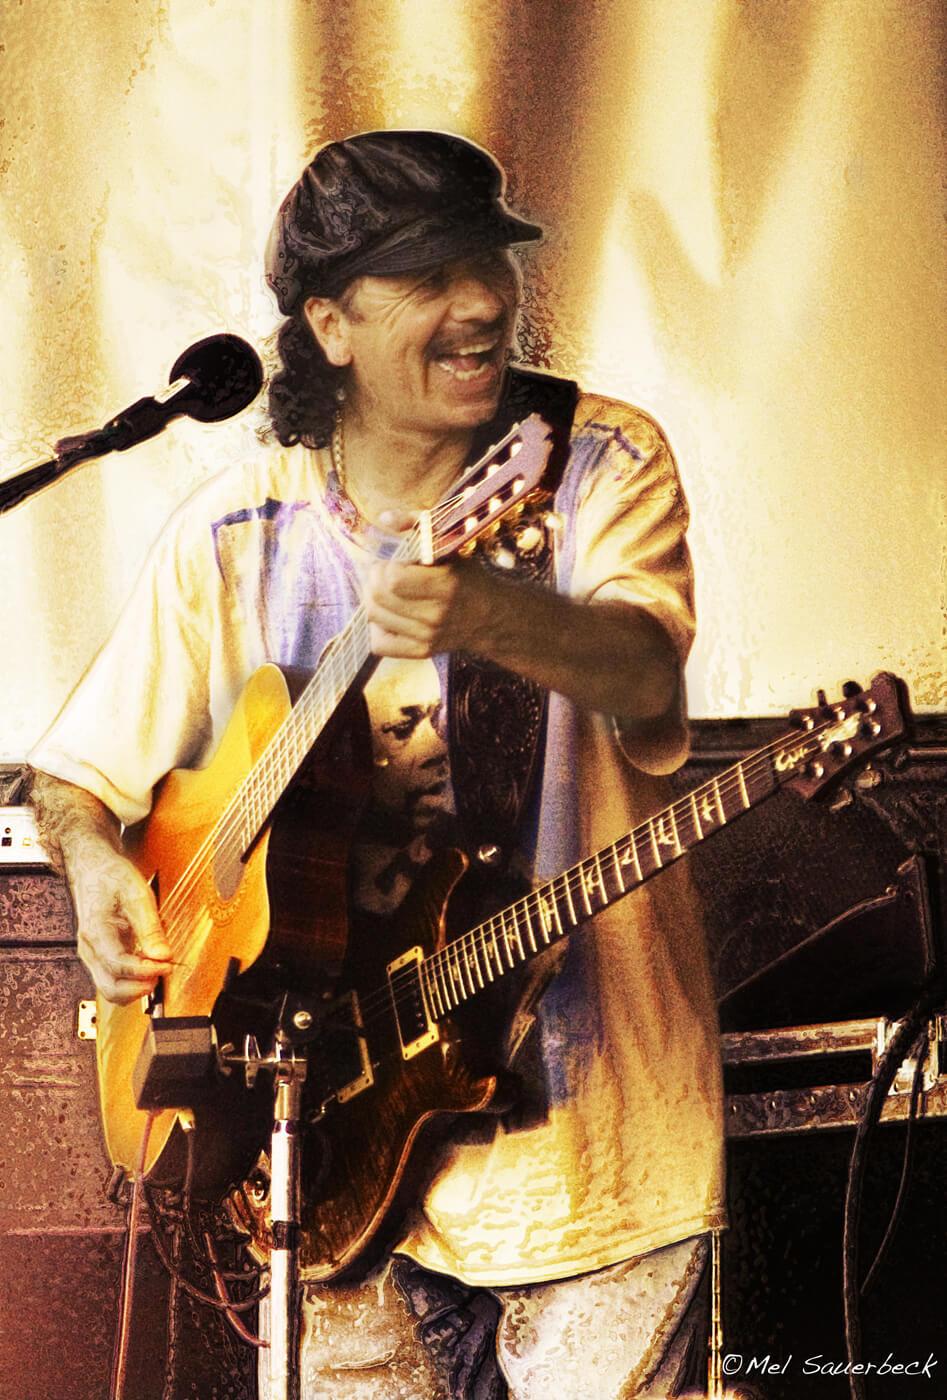 Santana with two guitars